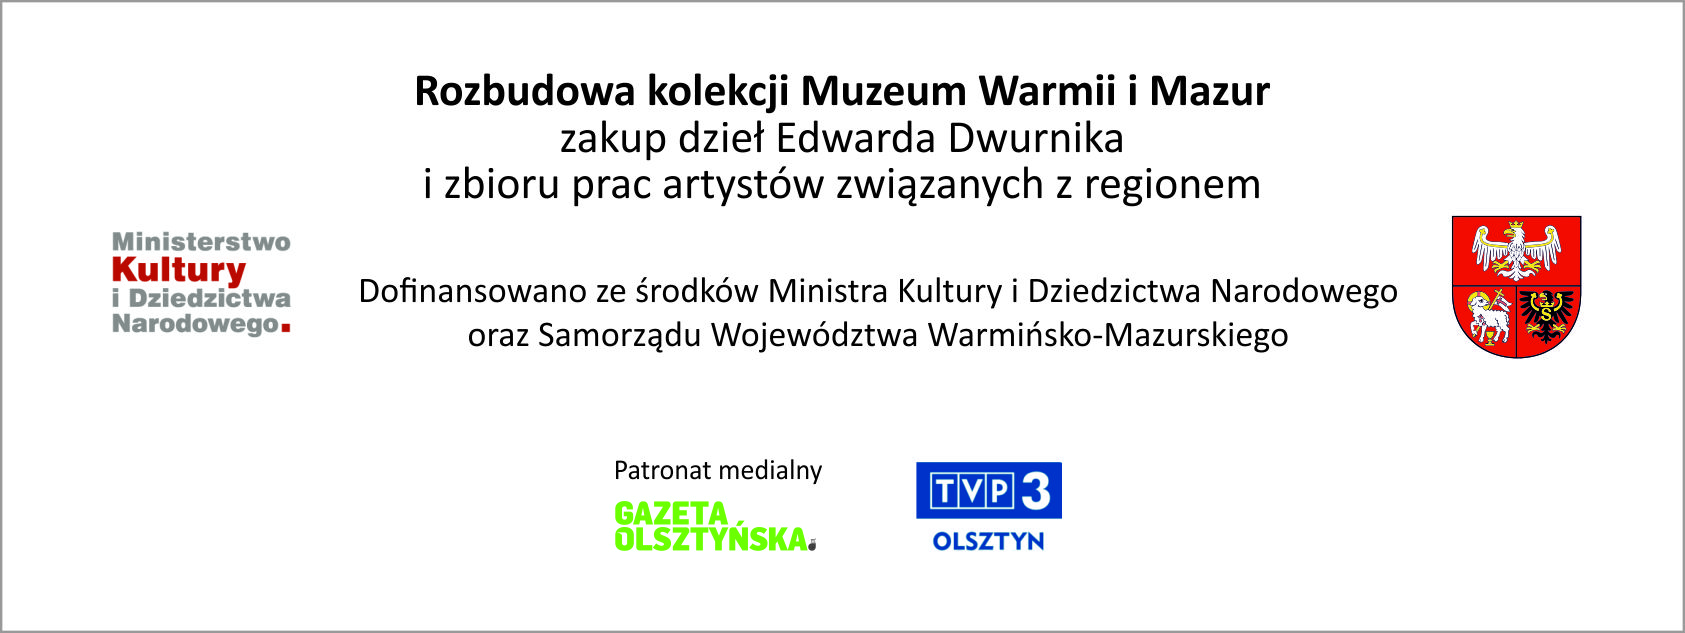 http://m.wmwm.pl/2017/12/orig/logotypy-dwurnik-5961.jpg